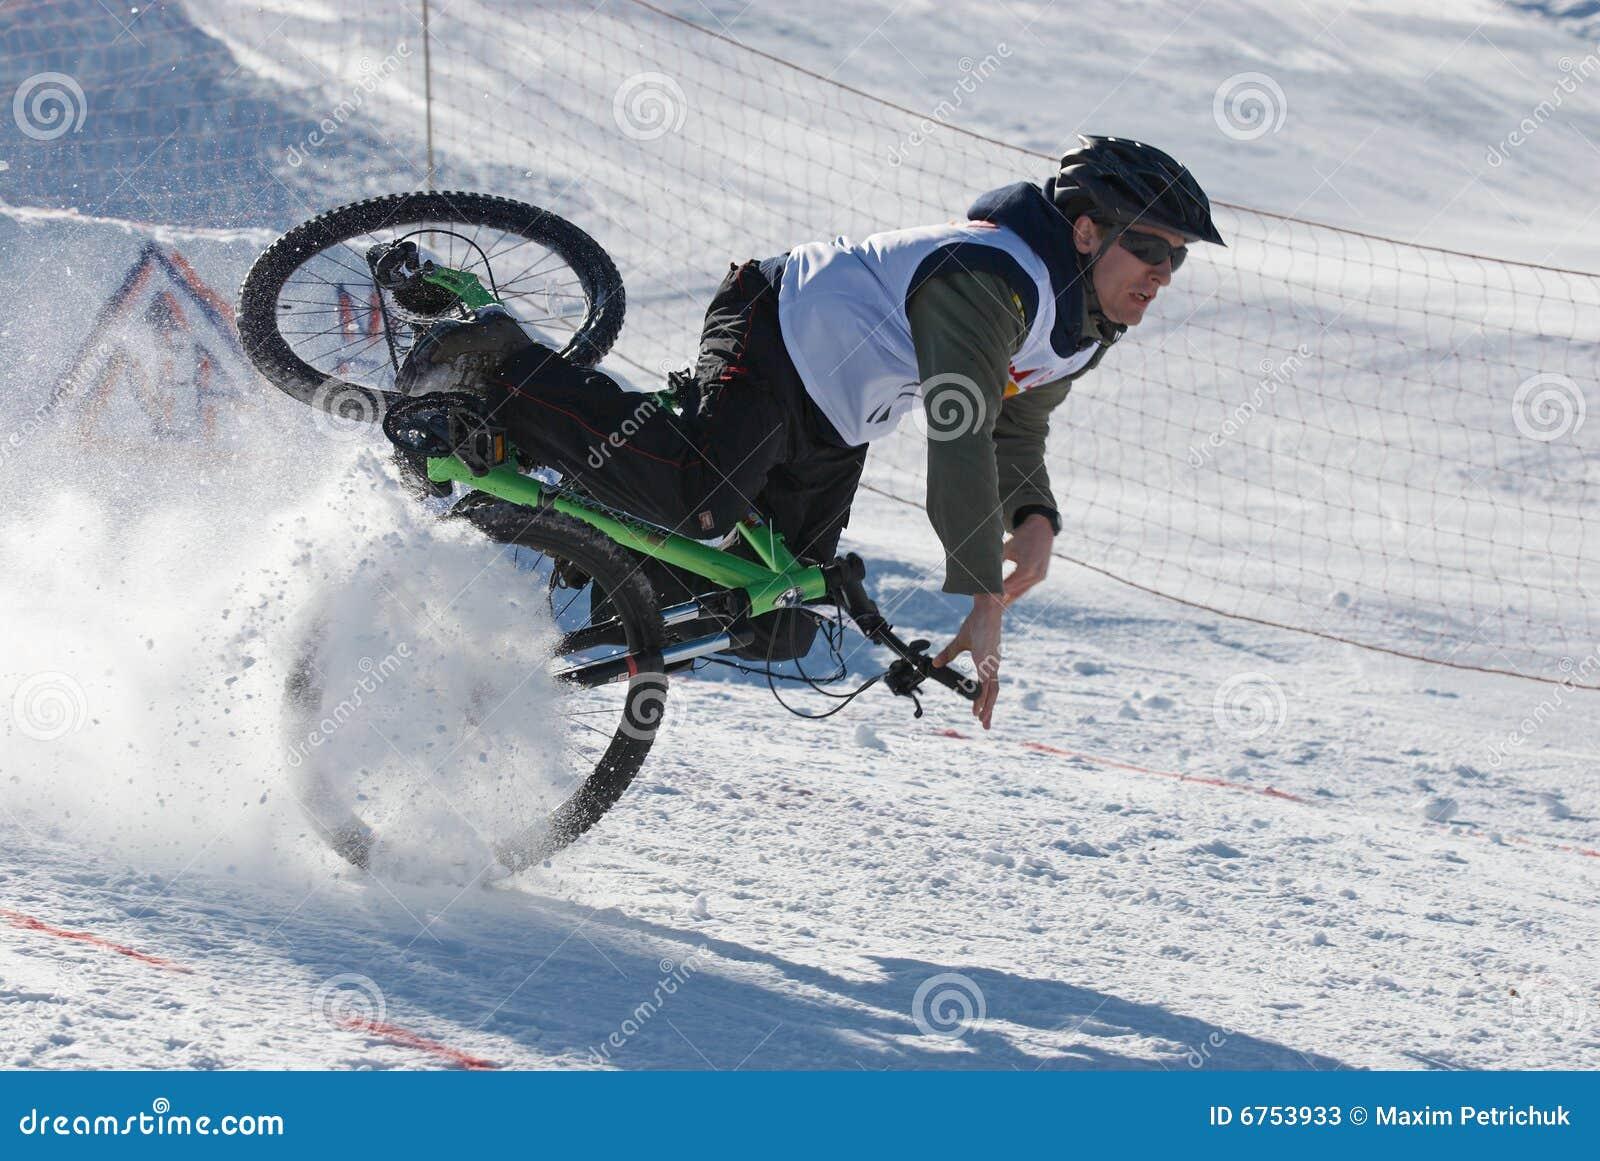 mountainbike snow winter extreme -#main